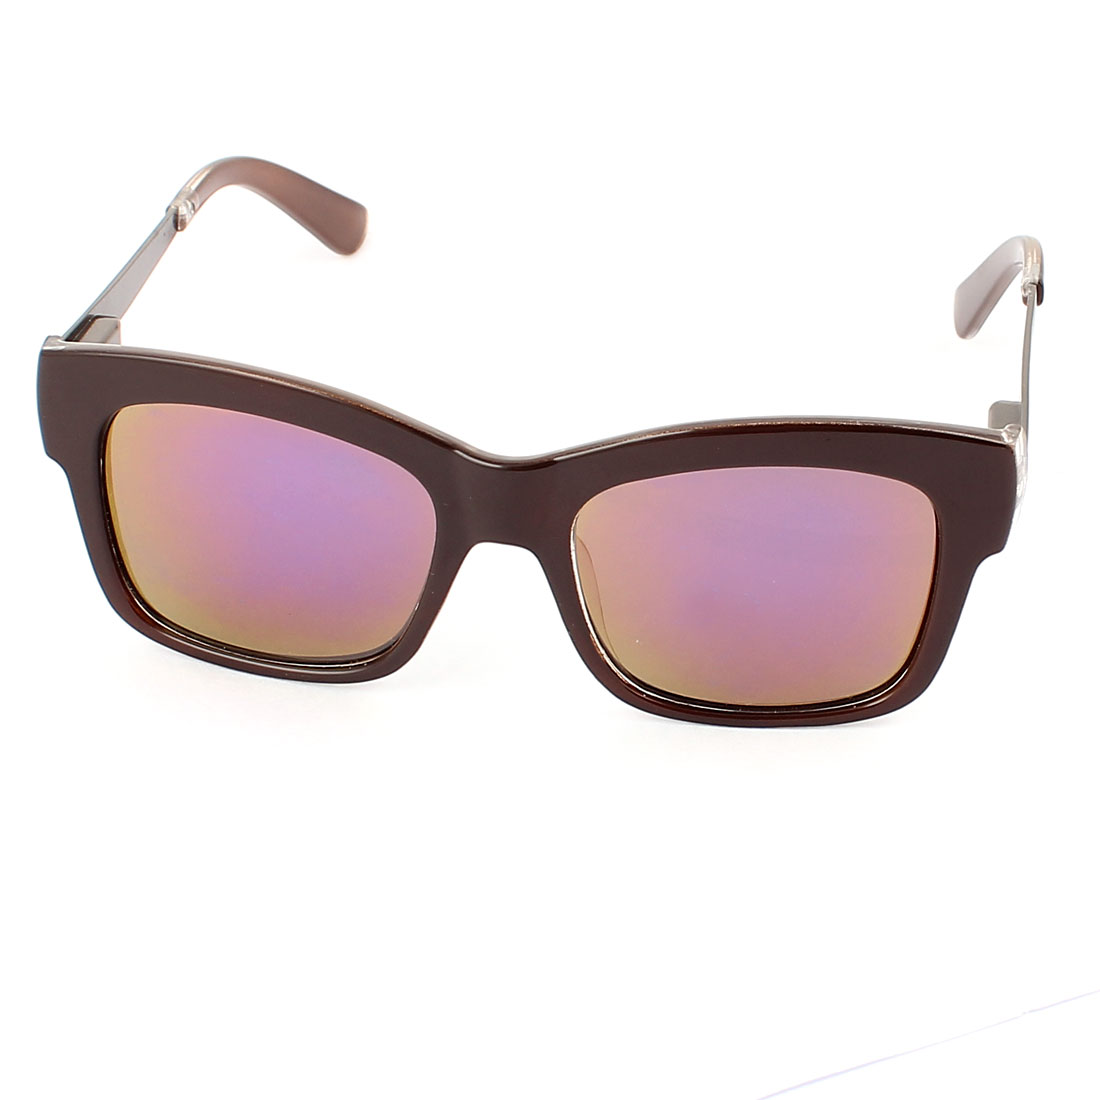 Women Ladies Gray Lens Sun Protection Outdoor Sunglasses Eyewear